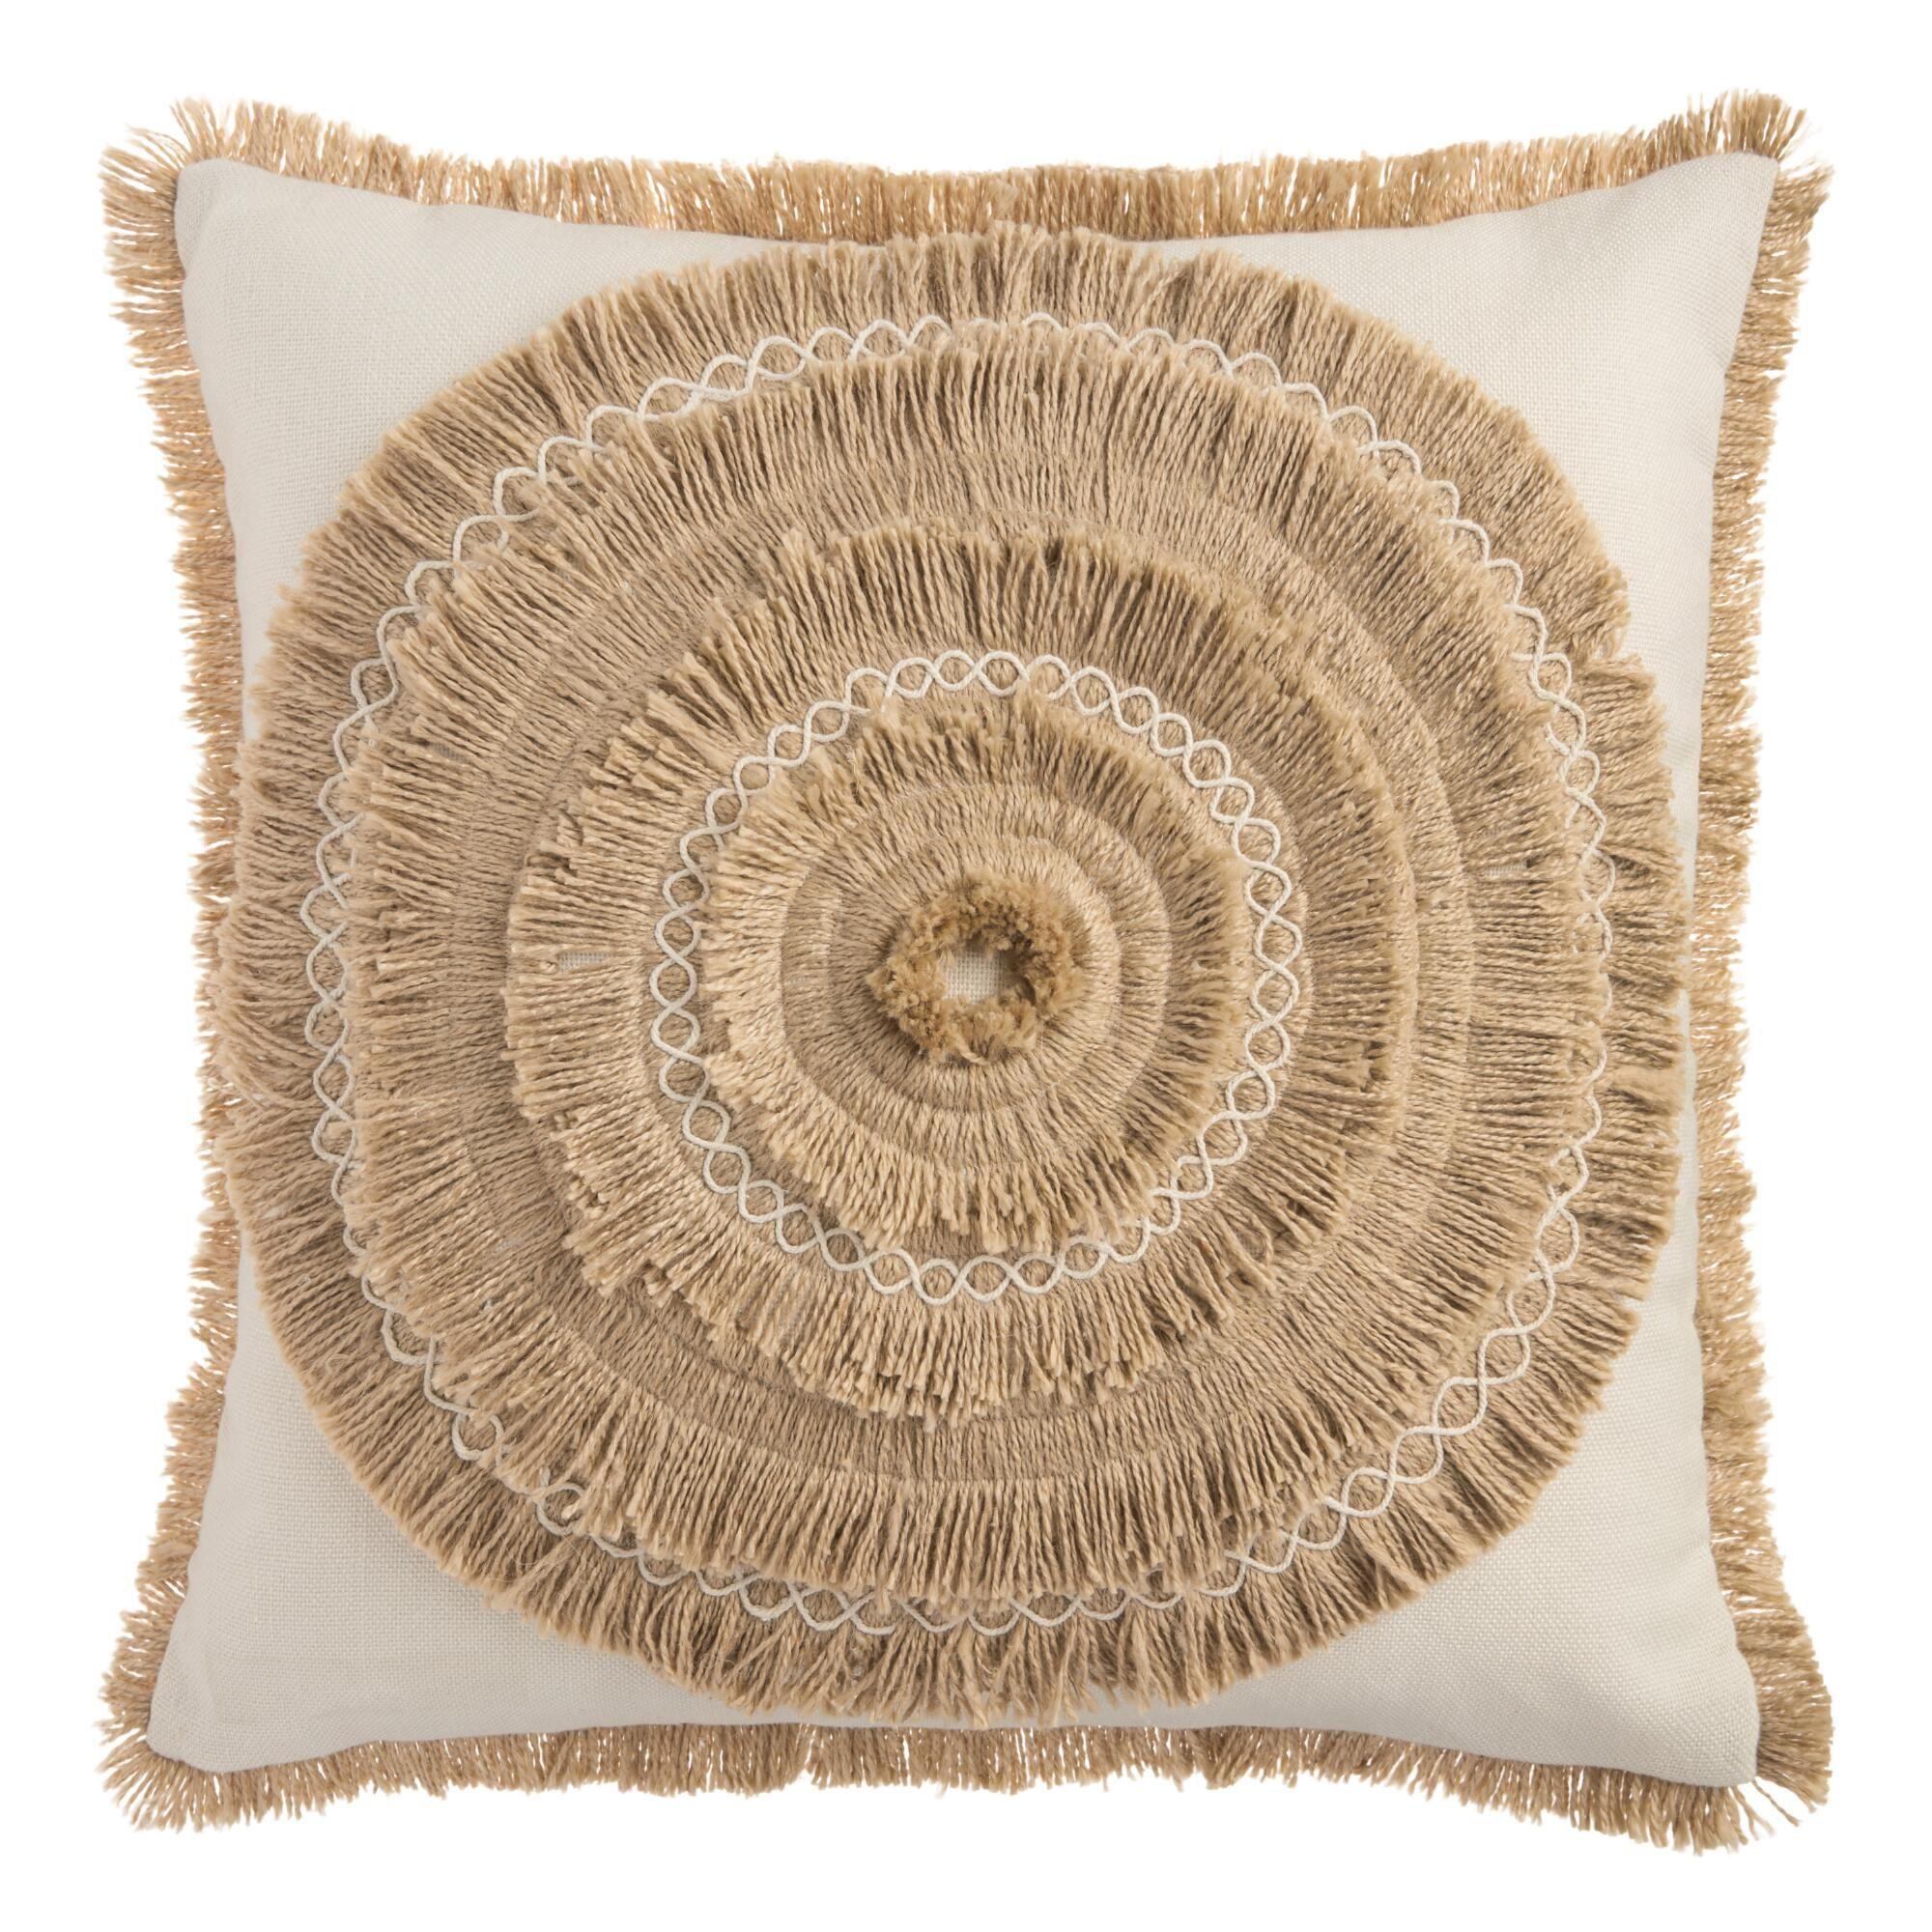 Tan Faux Raffia Indoor Outdoor Throw Pillow Outdoor Throw Pillows Throw Pillows Cost Plus World Market